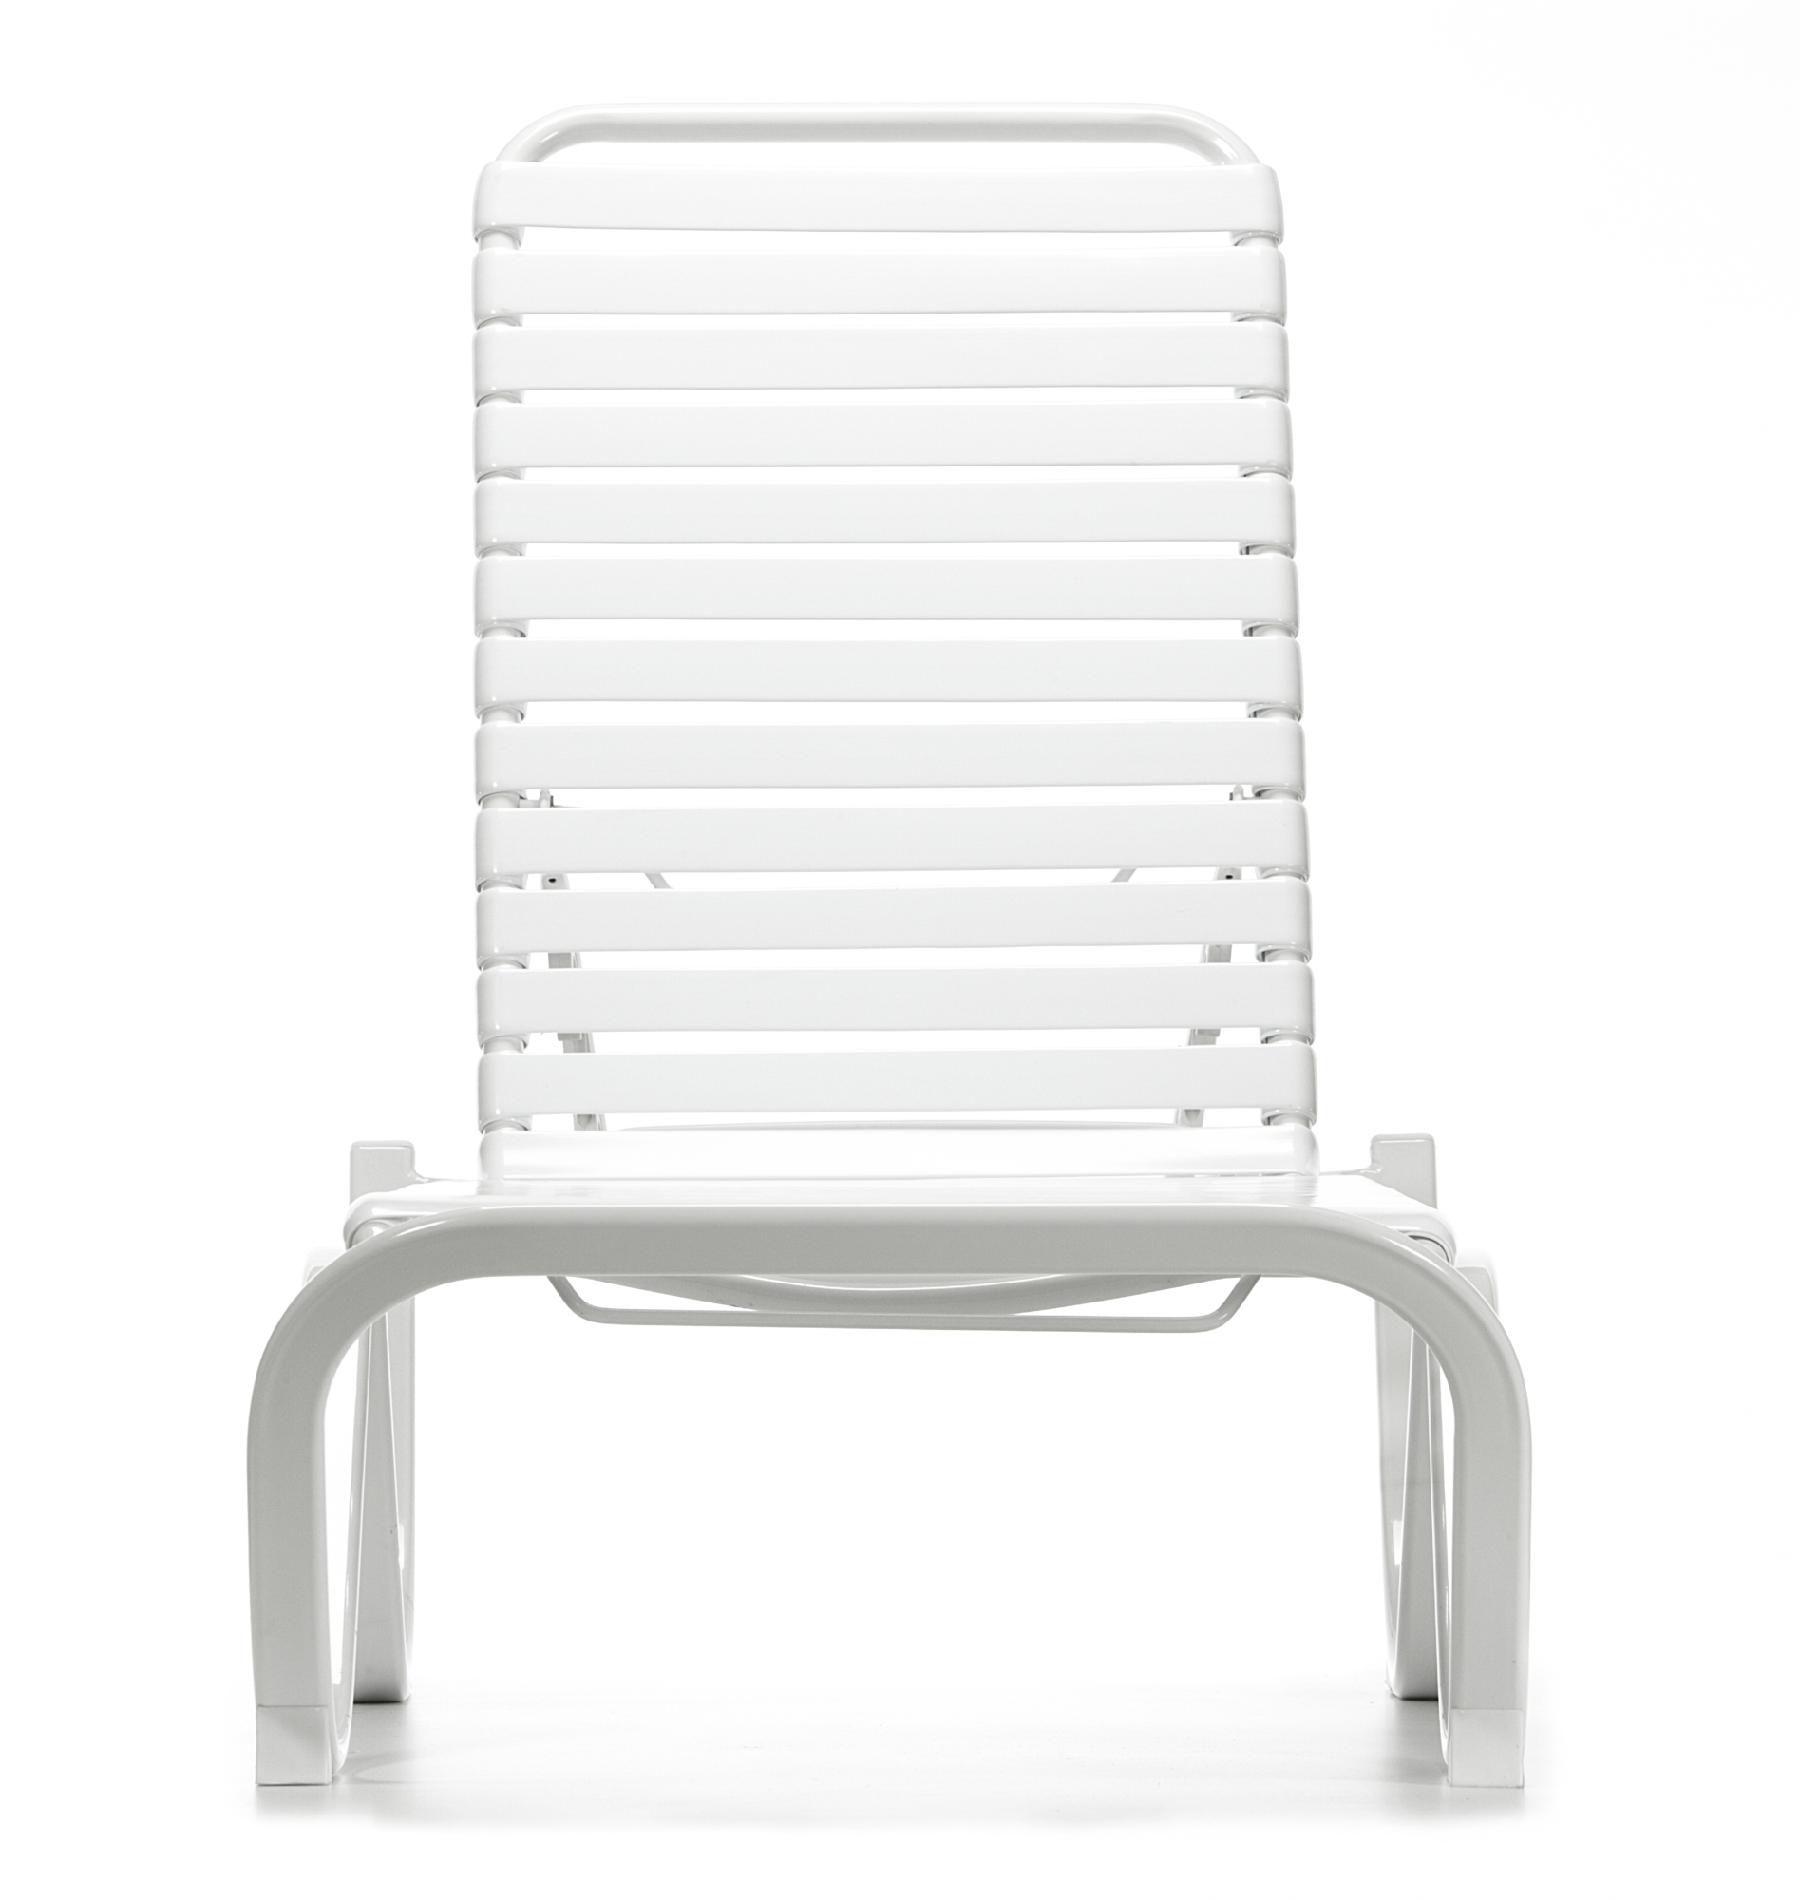 Grand Resort Aluminum PVC Strap Lounge *Limited Availability